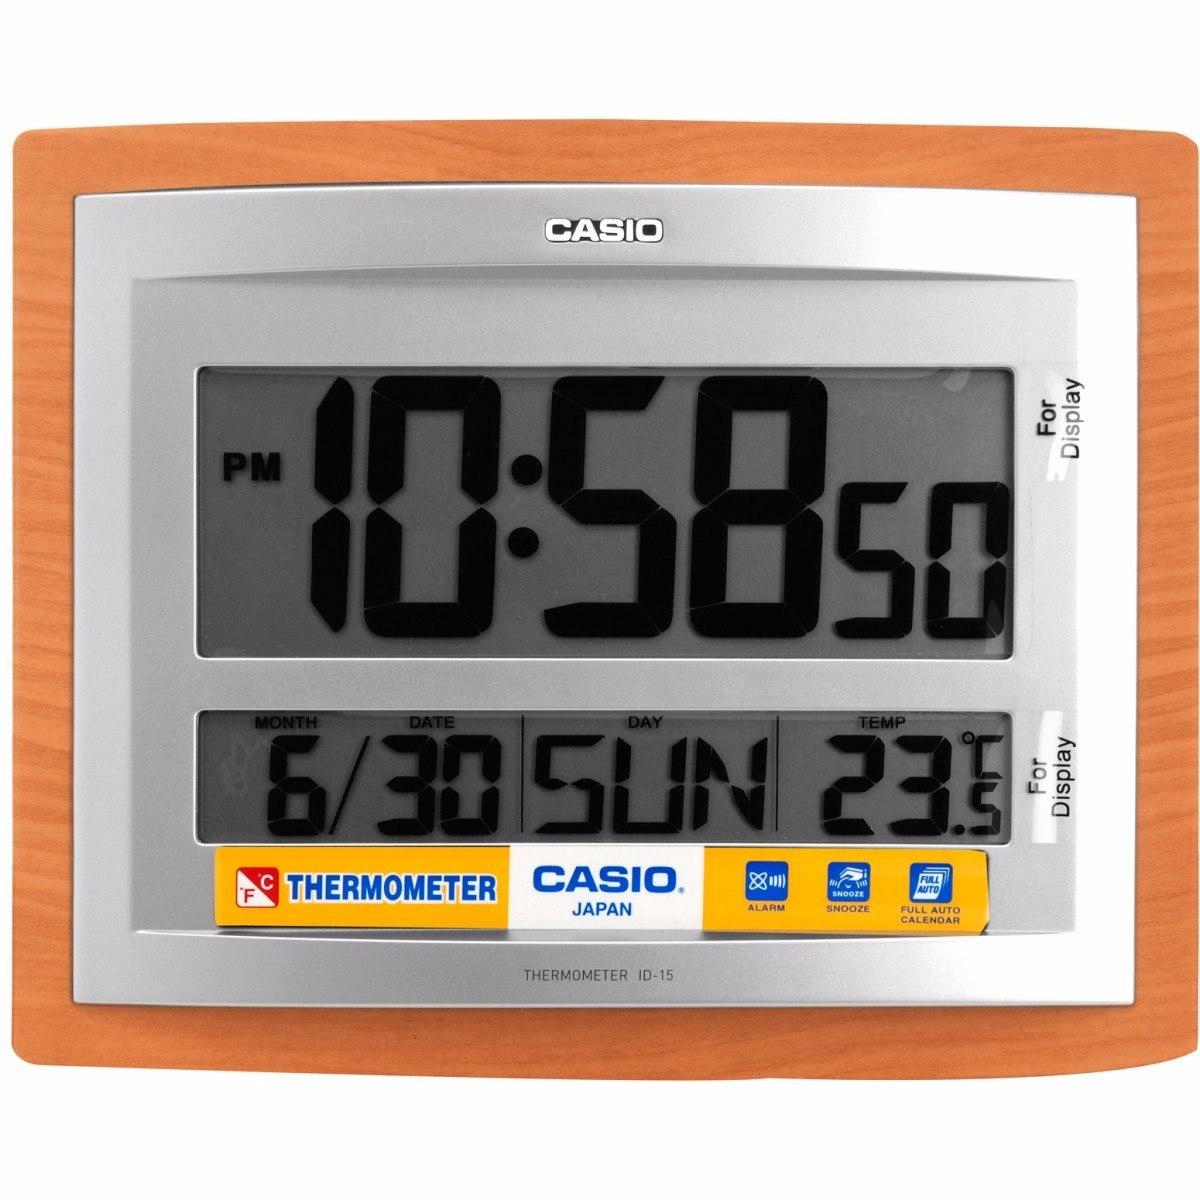 e5b47943c40c Reloj Pared Escritorio Casio Digital Alarma Fecha Termometro -   134.000 en  Mercado Libre